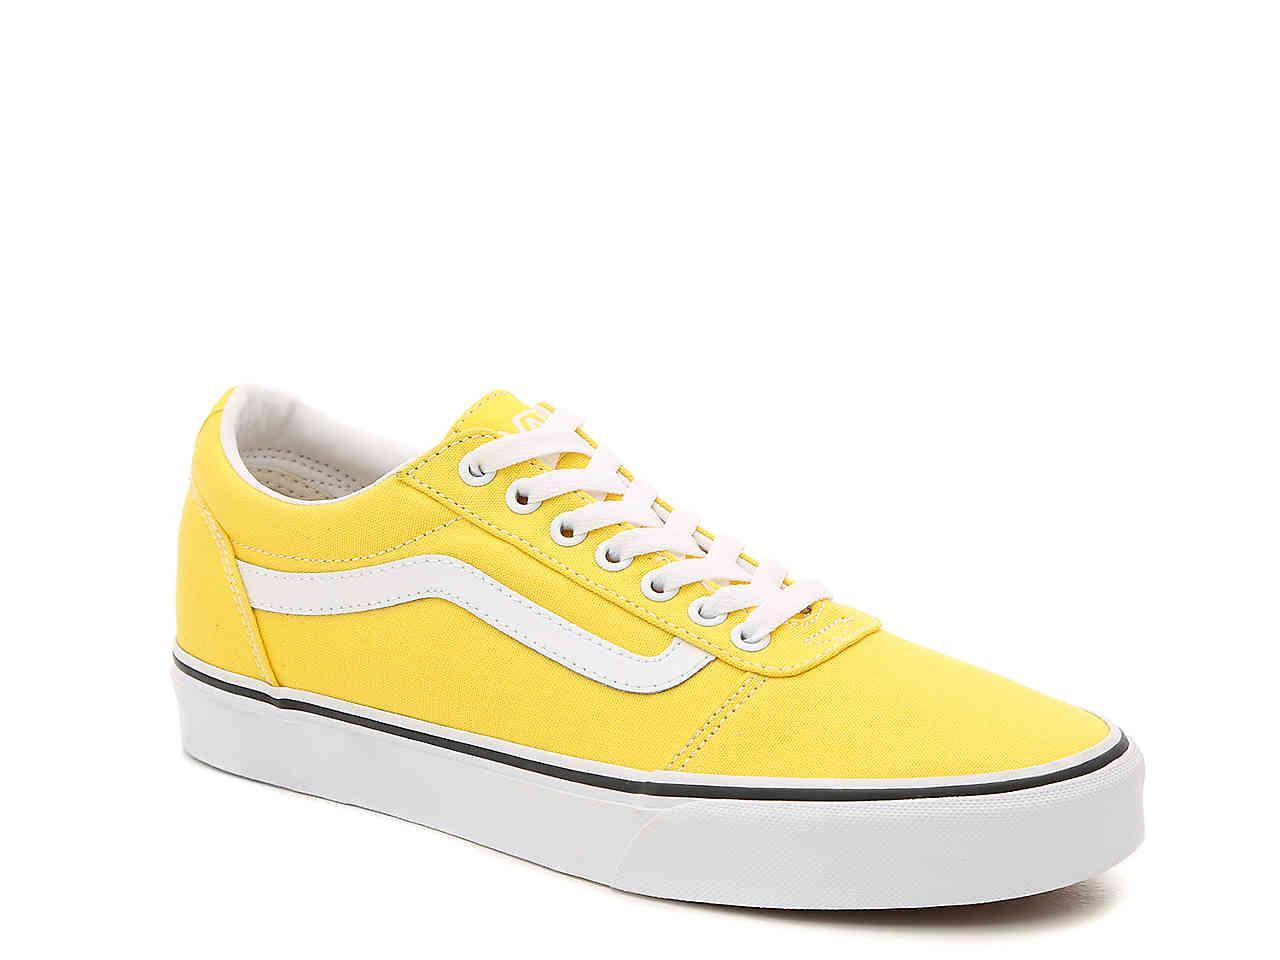 Vans Canvas Ward Lo Sneaker in Yellow